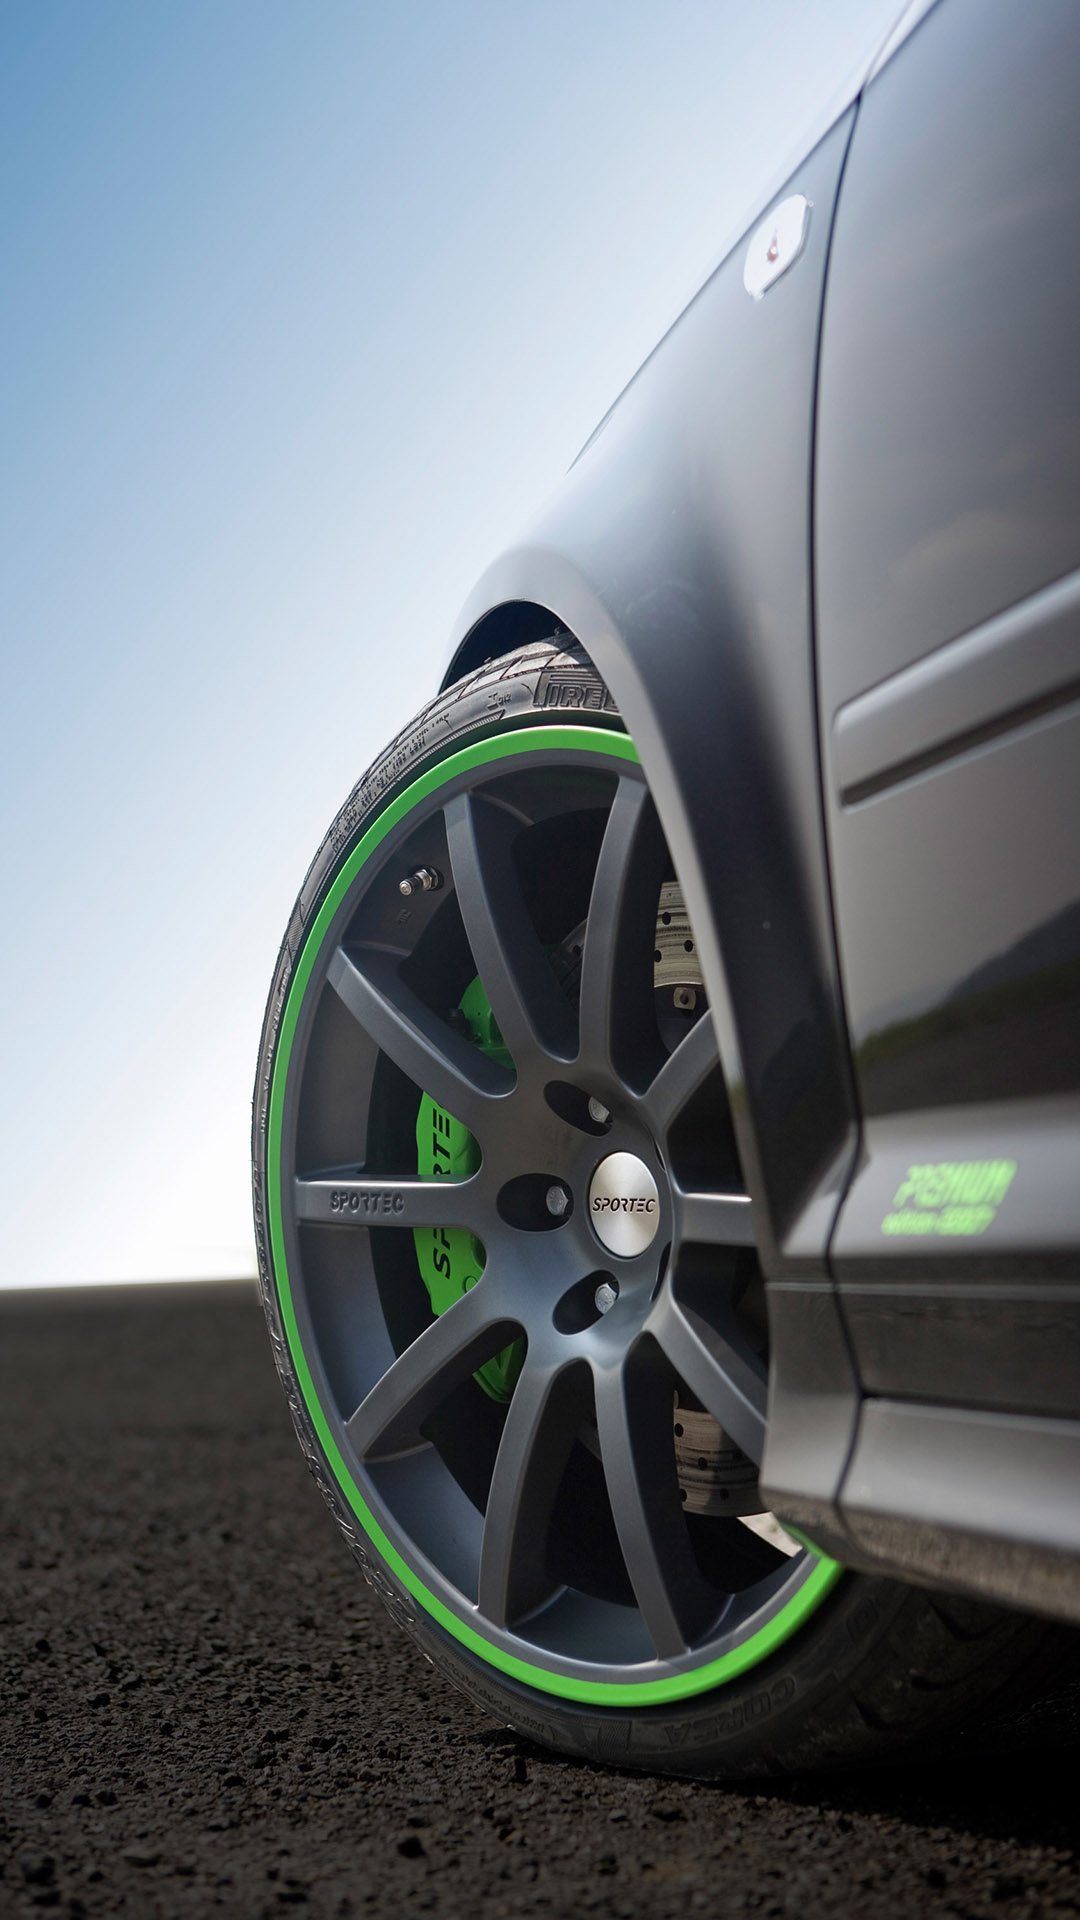 Sportec RS 300 htc one wallpaper